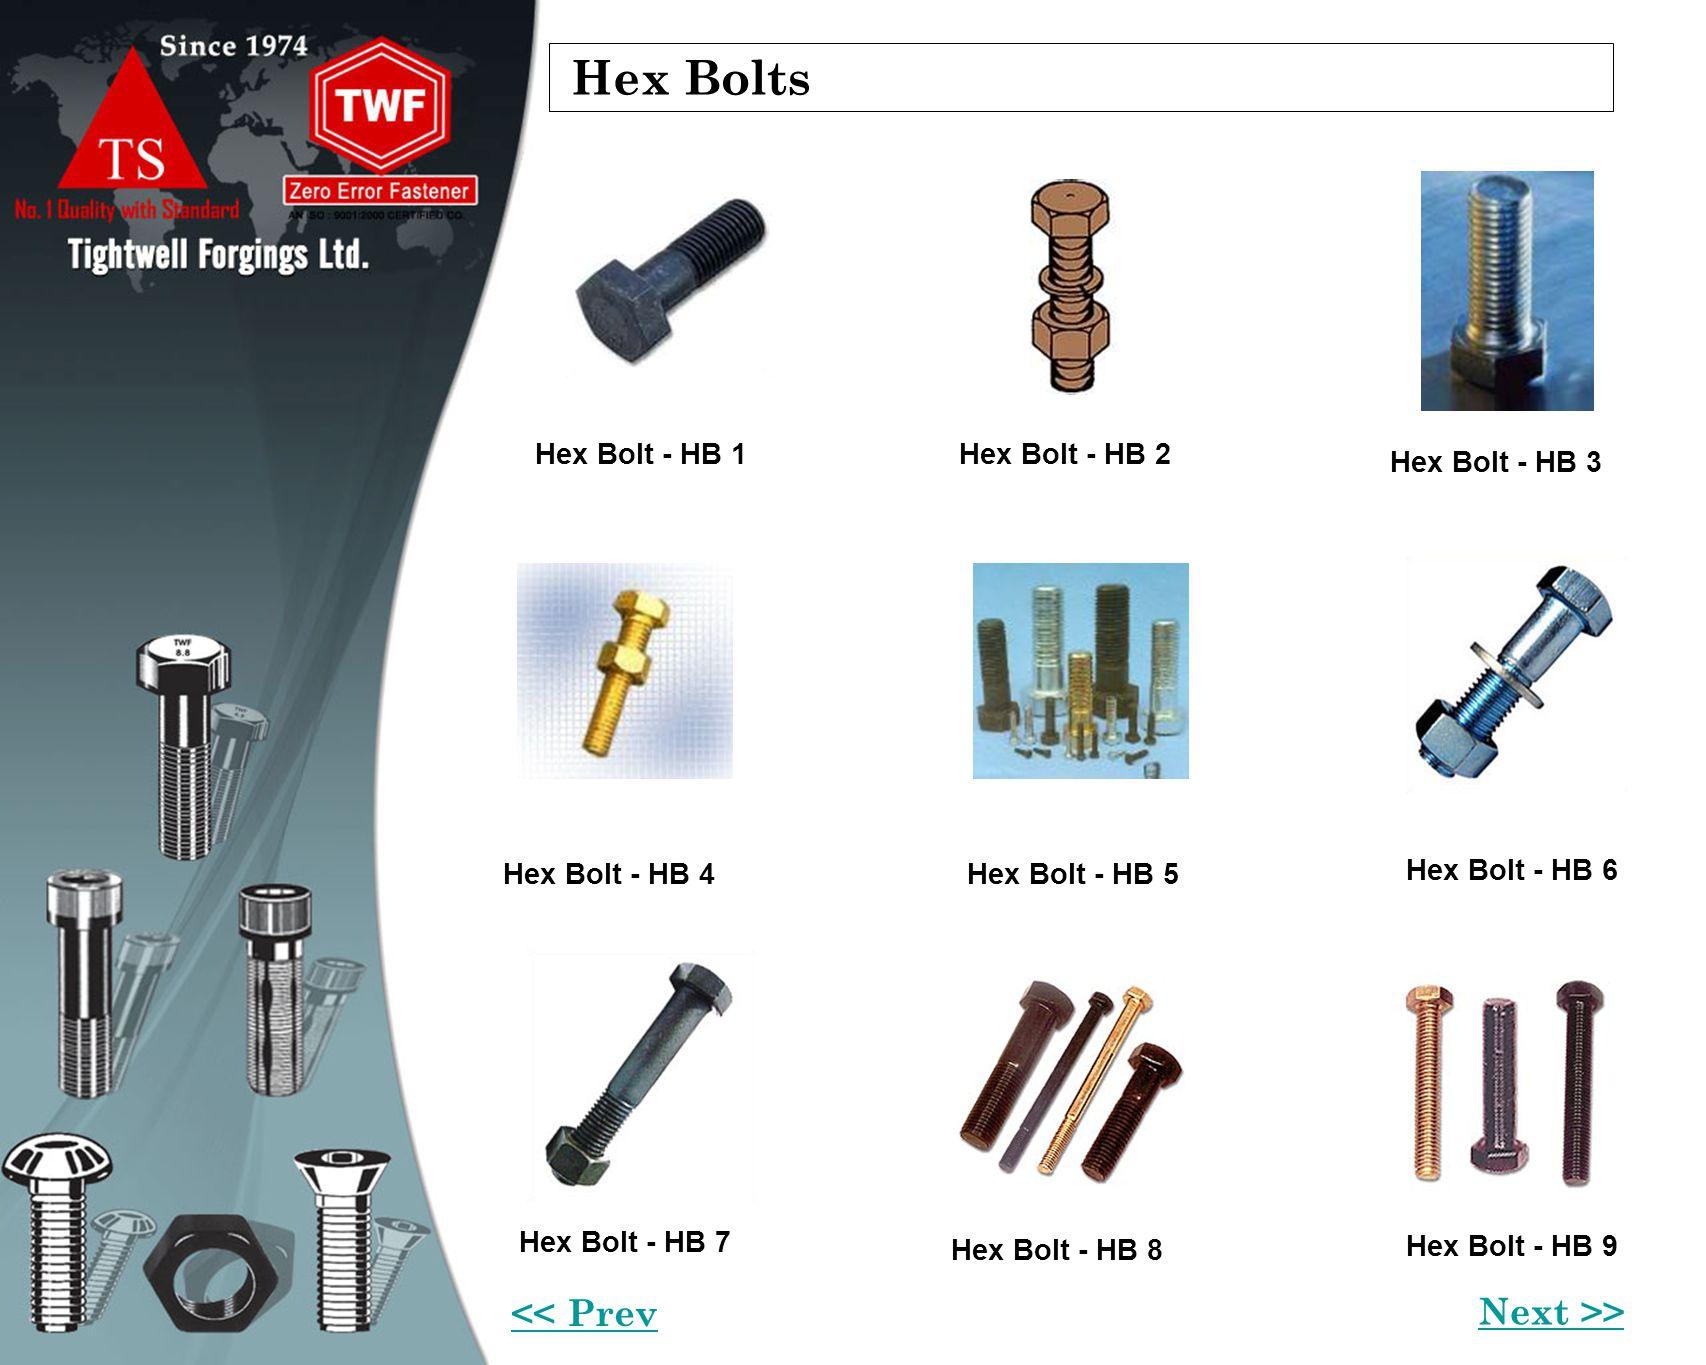 Hex Bolts Hex Bolt - HB 1Hex Bolt - HB 2 Hex Bolt - HB 3 Hex Bolt - HB 6 Hex Bolt - HB 9 Hex Bolt - HB 8 Hex Bolt - HB 7 Hex Bolt - HB 4Hex Bolt - HB 5 Next >> << Prev